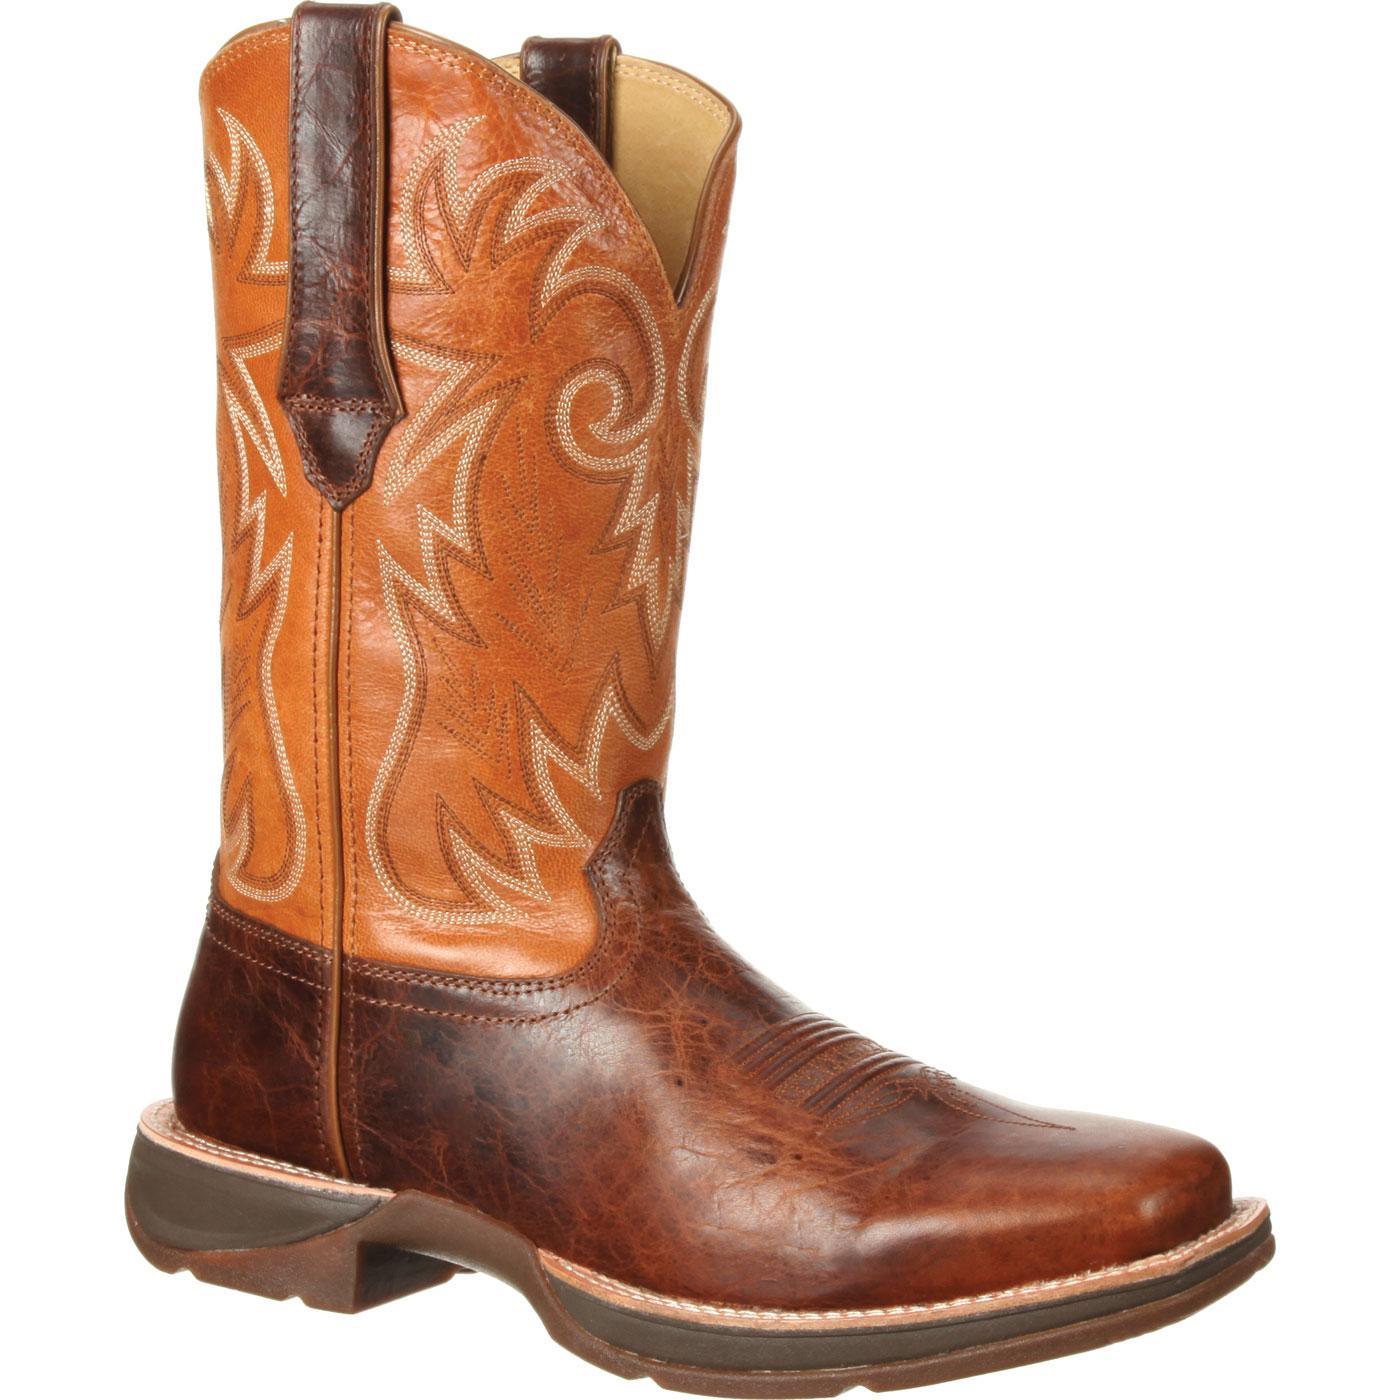 0fadd5651f3 Ramped Up Rebel by Durango Western Boot